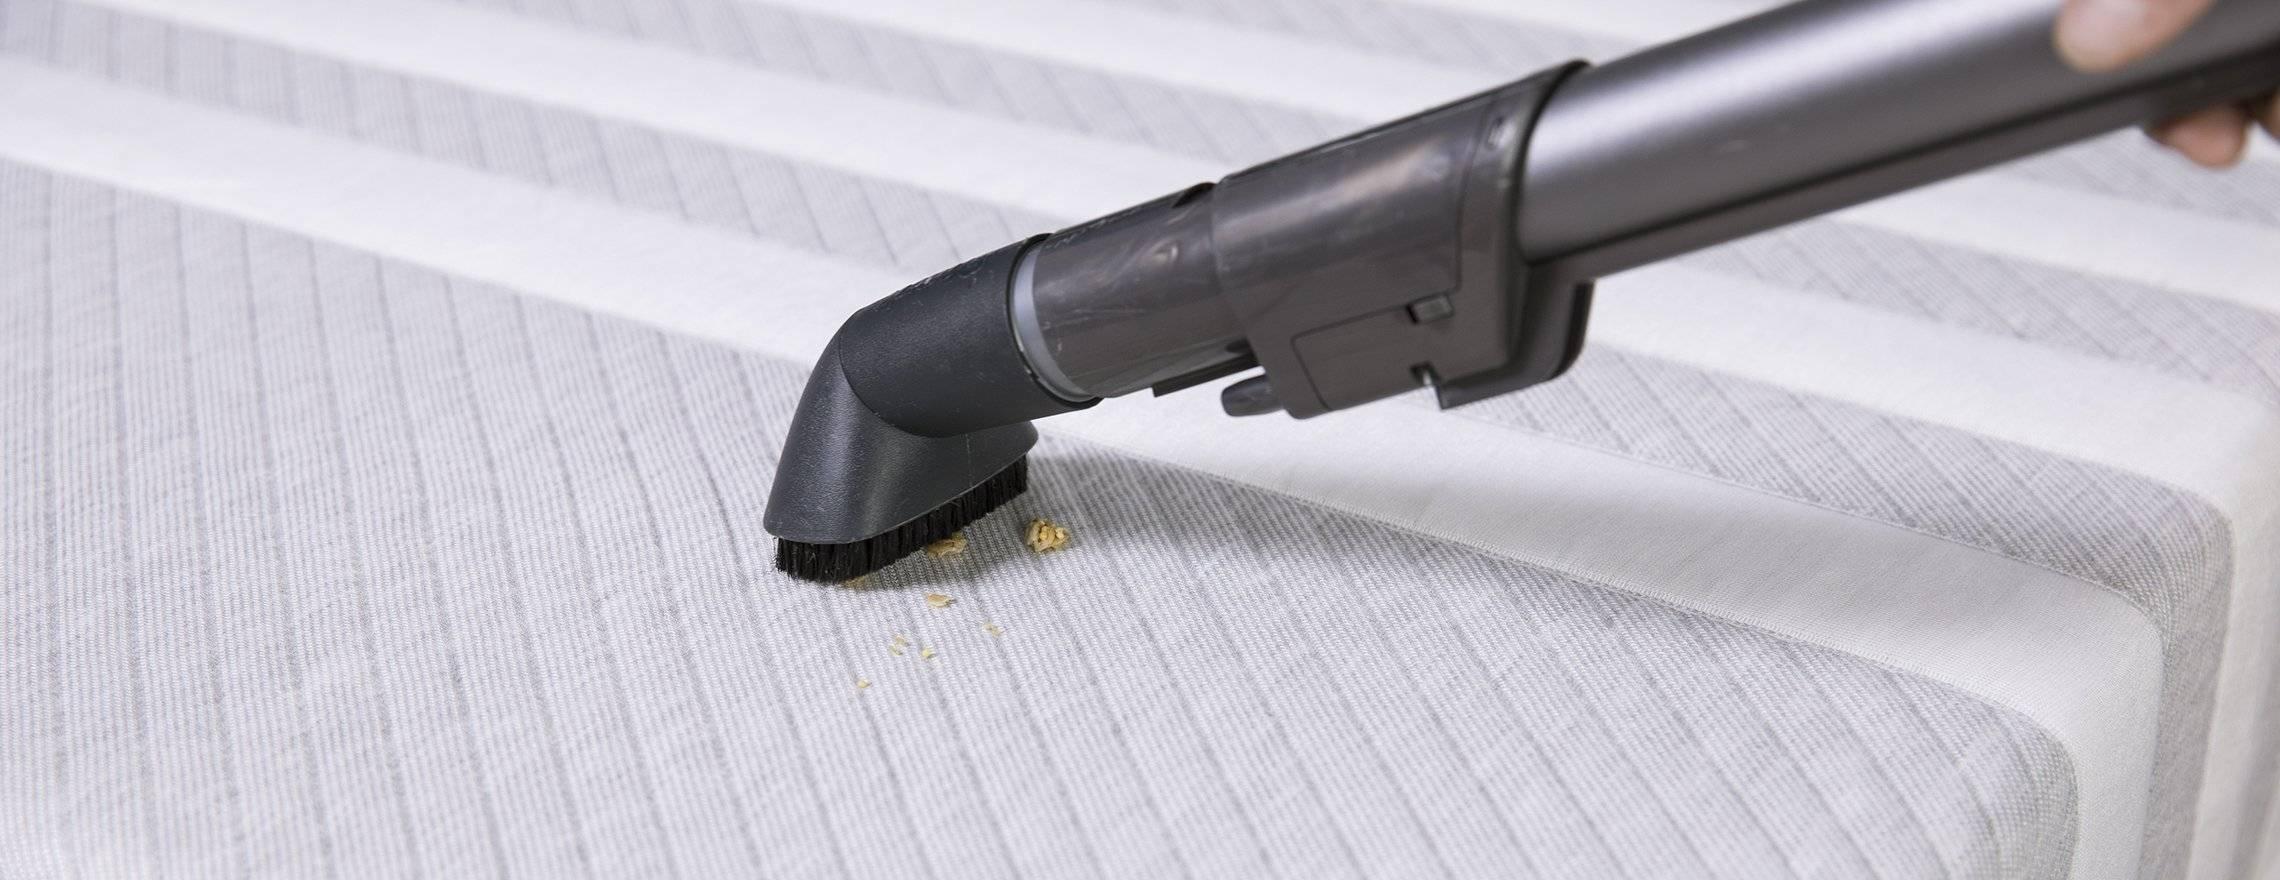 vacuuming_crumbs_off_a_mattress